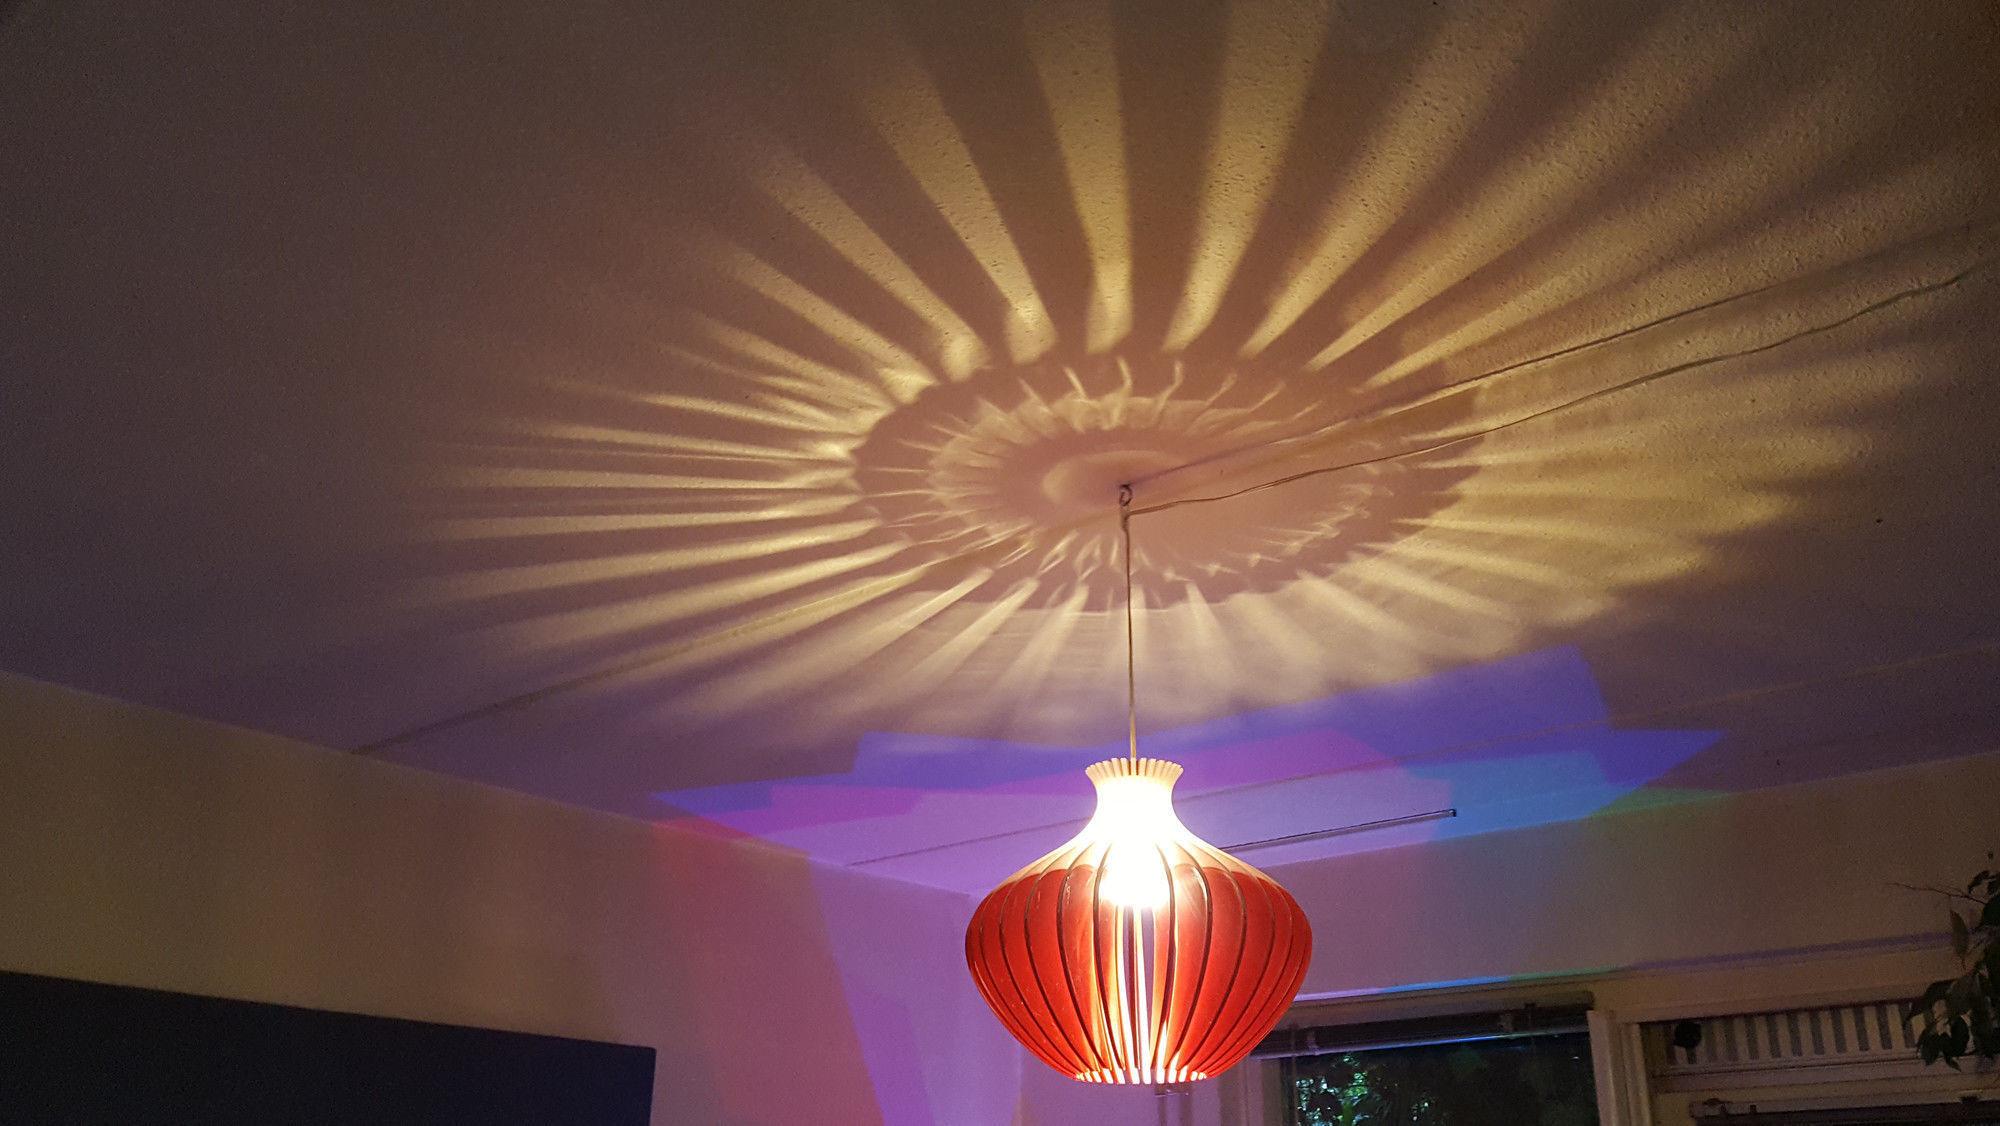 The Laminar Lamp